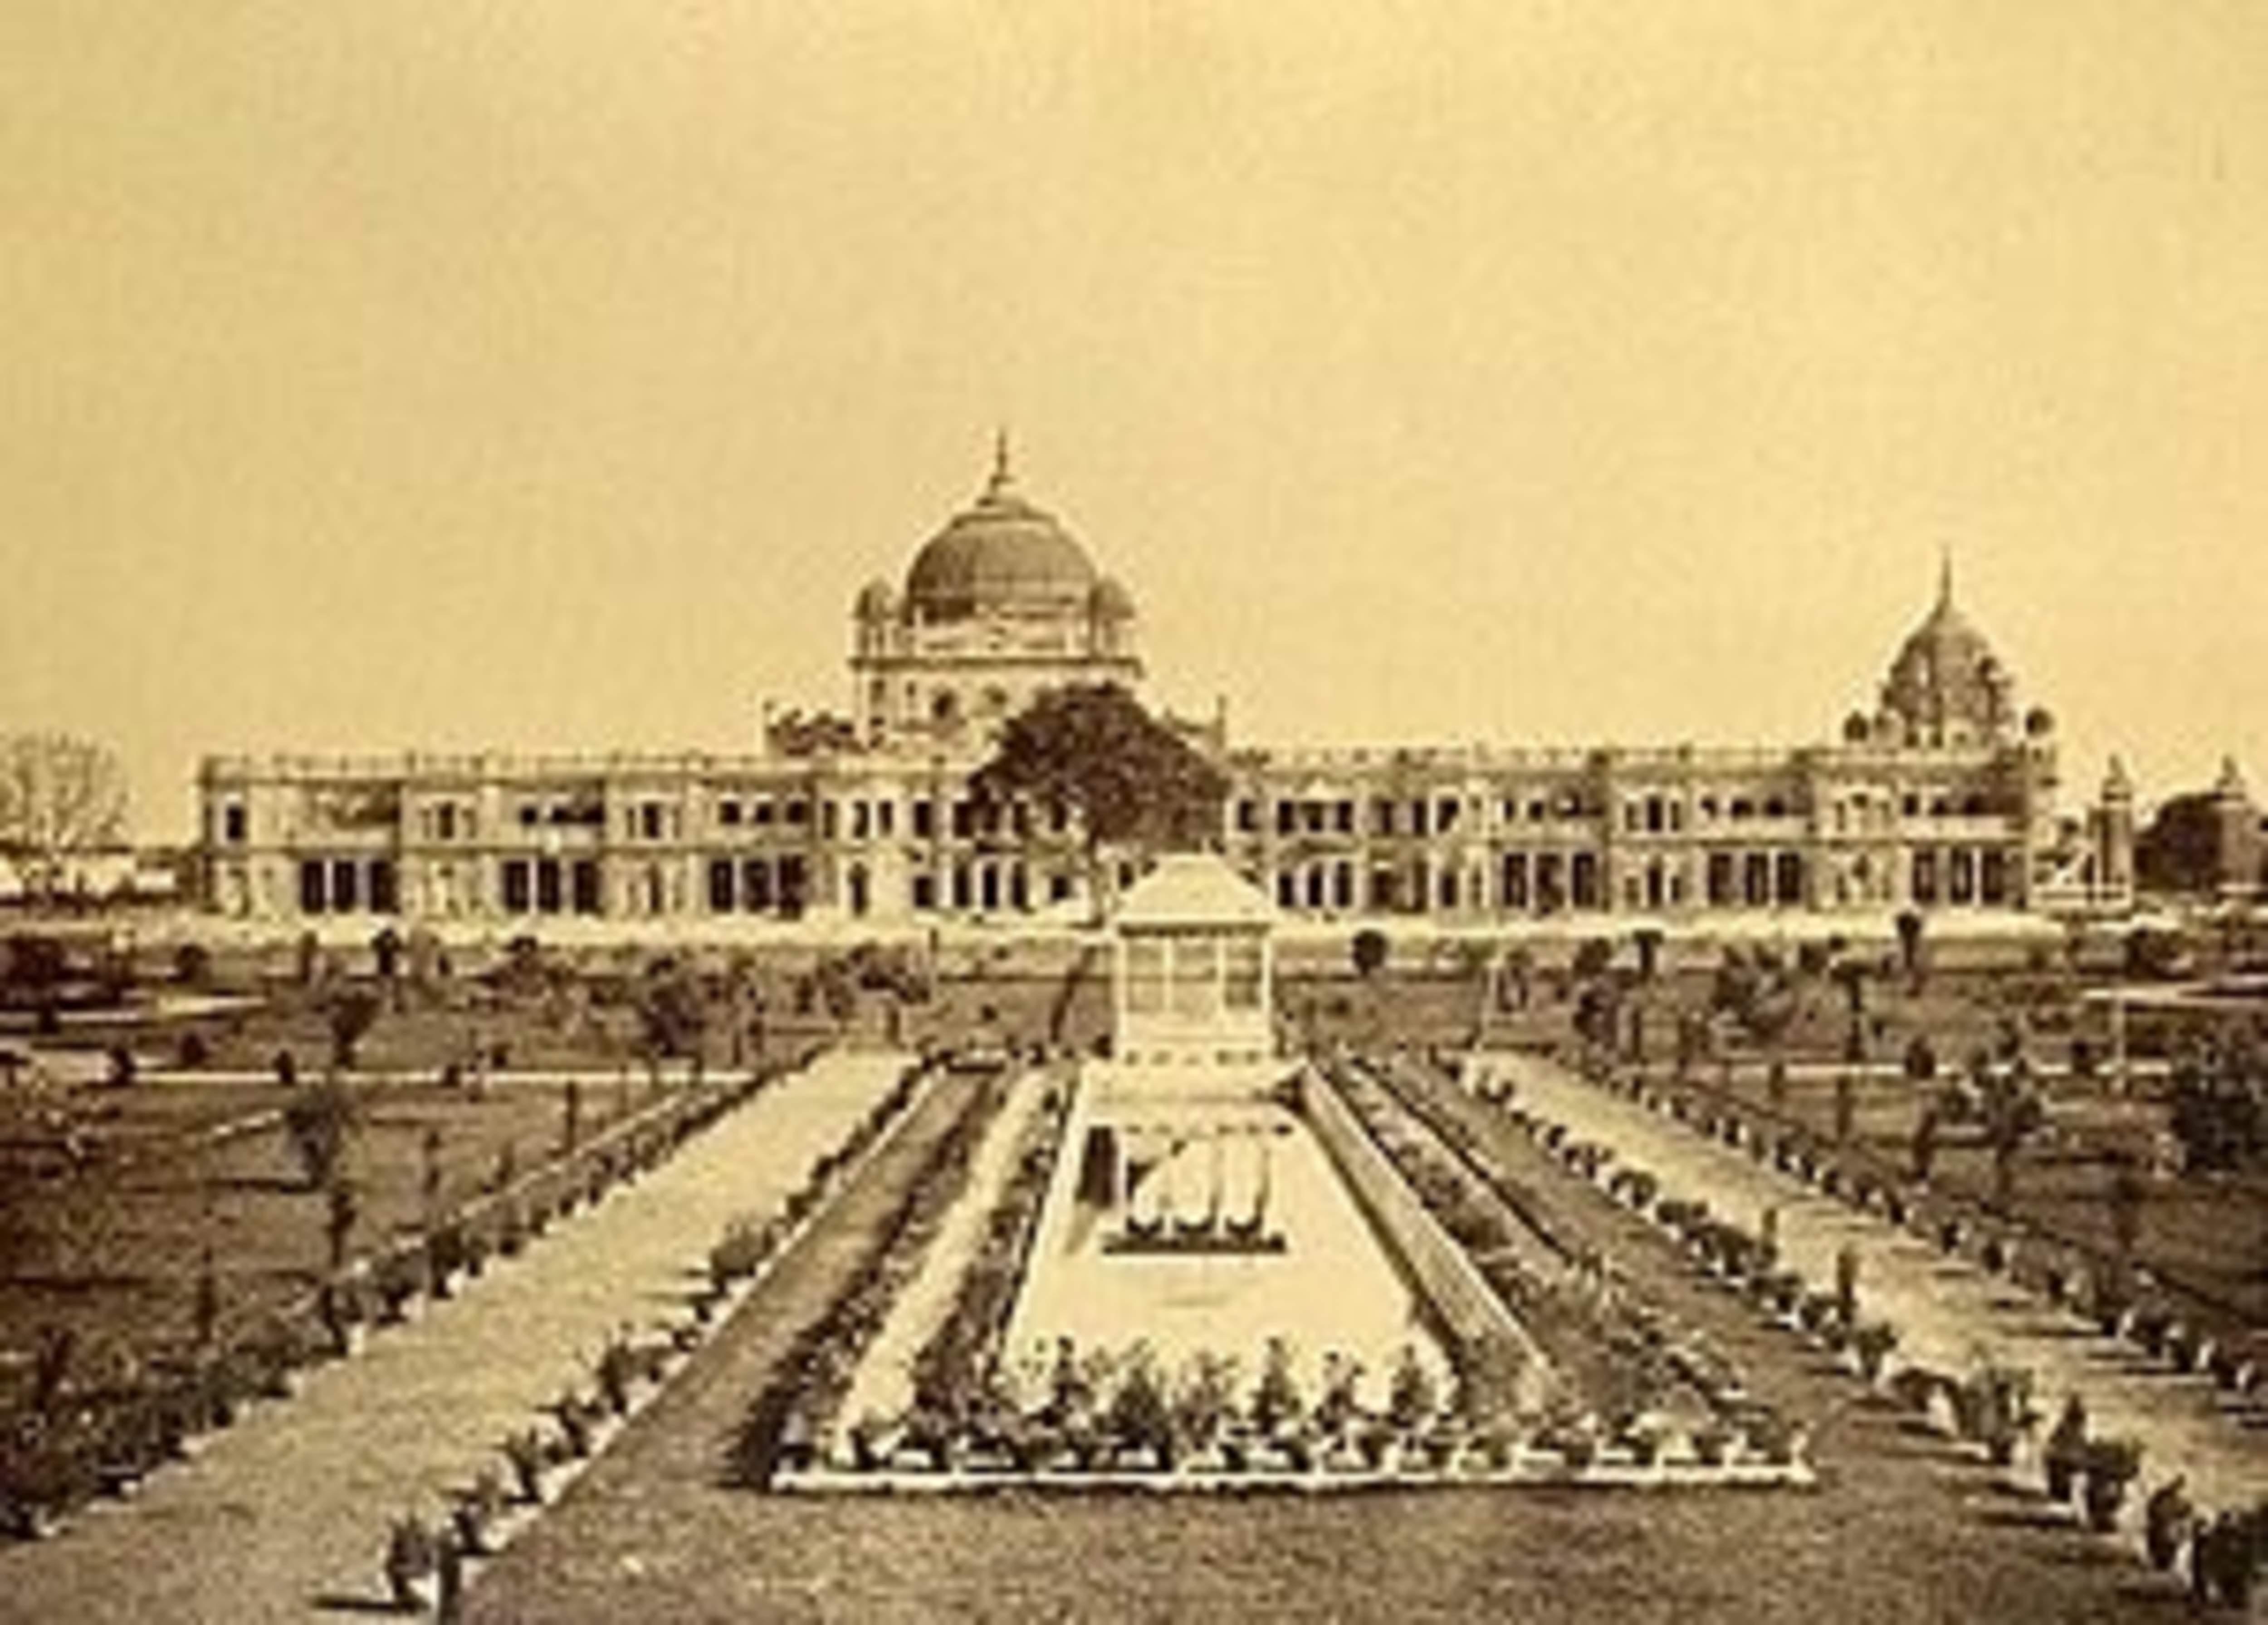 Kaiser Bagh Palace, the palace of Wajid Ali Shah (photograph taken between 1865 and 1882, wikipedia)